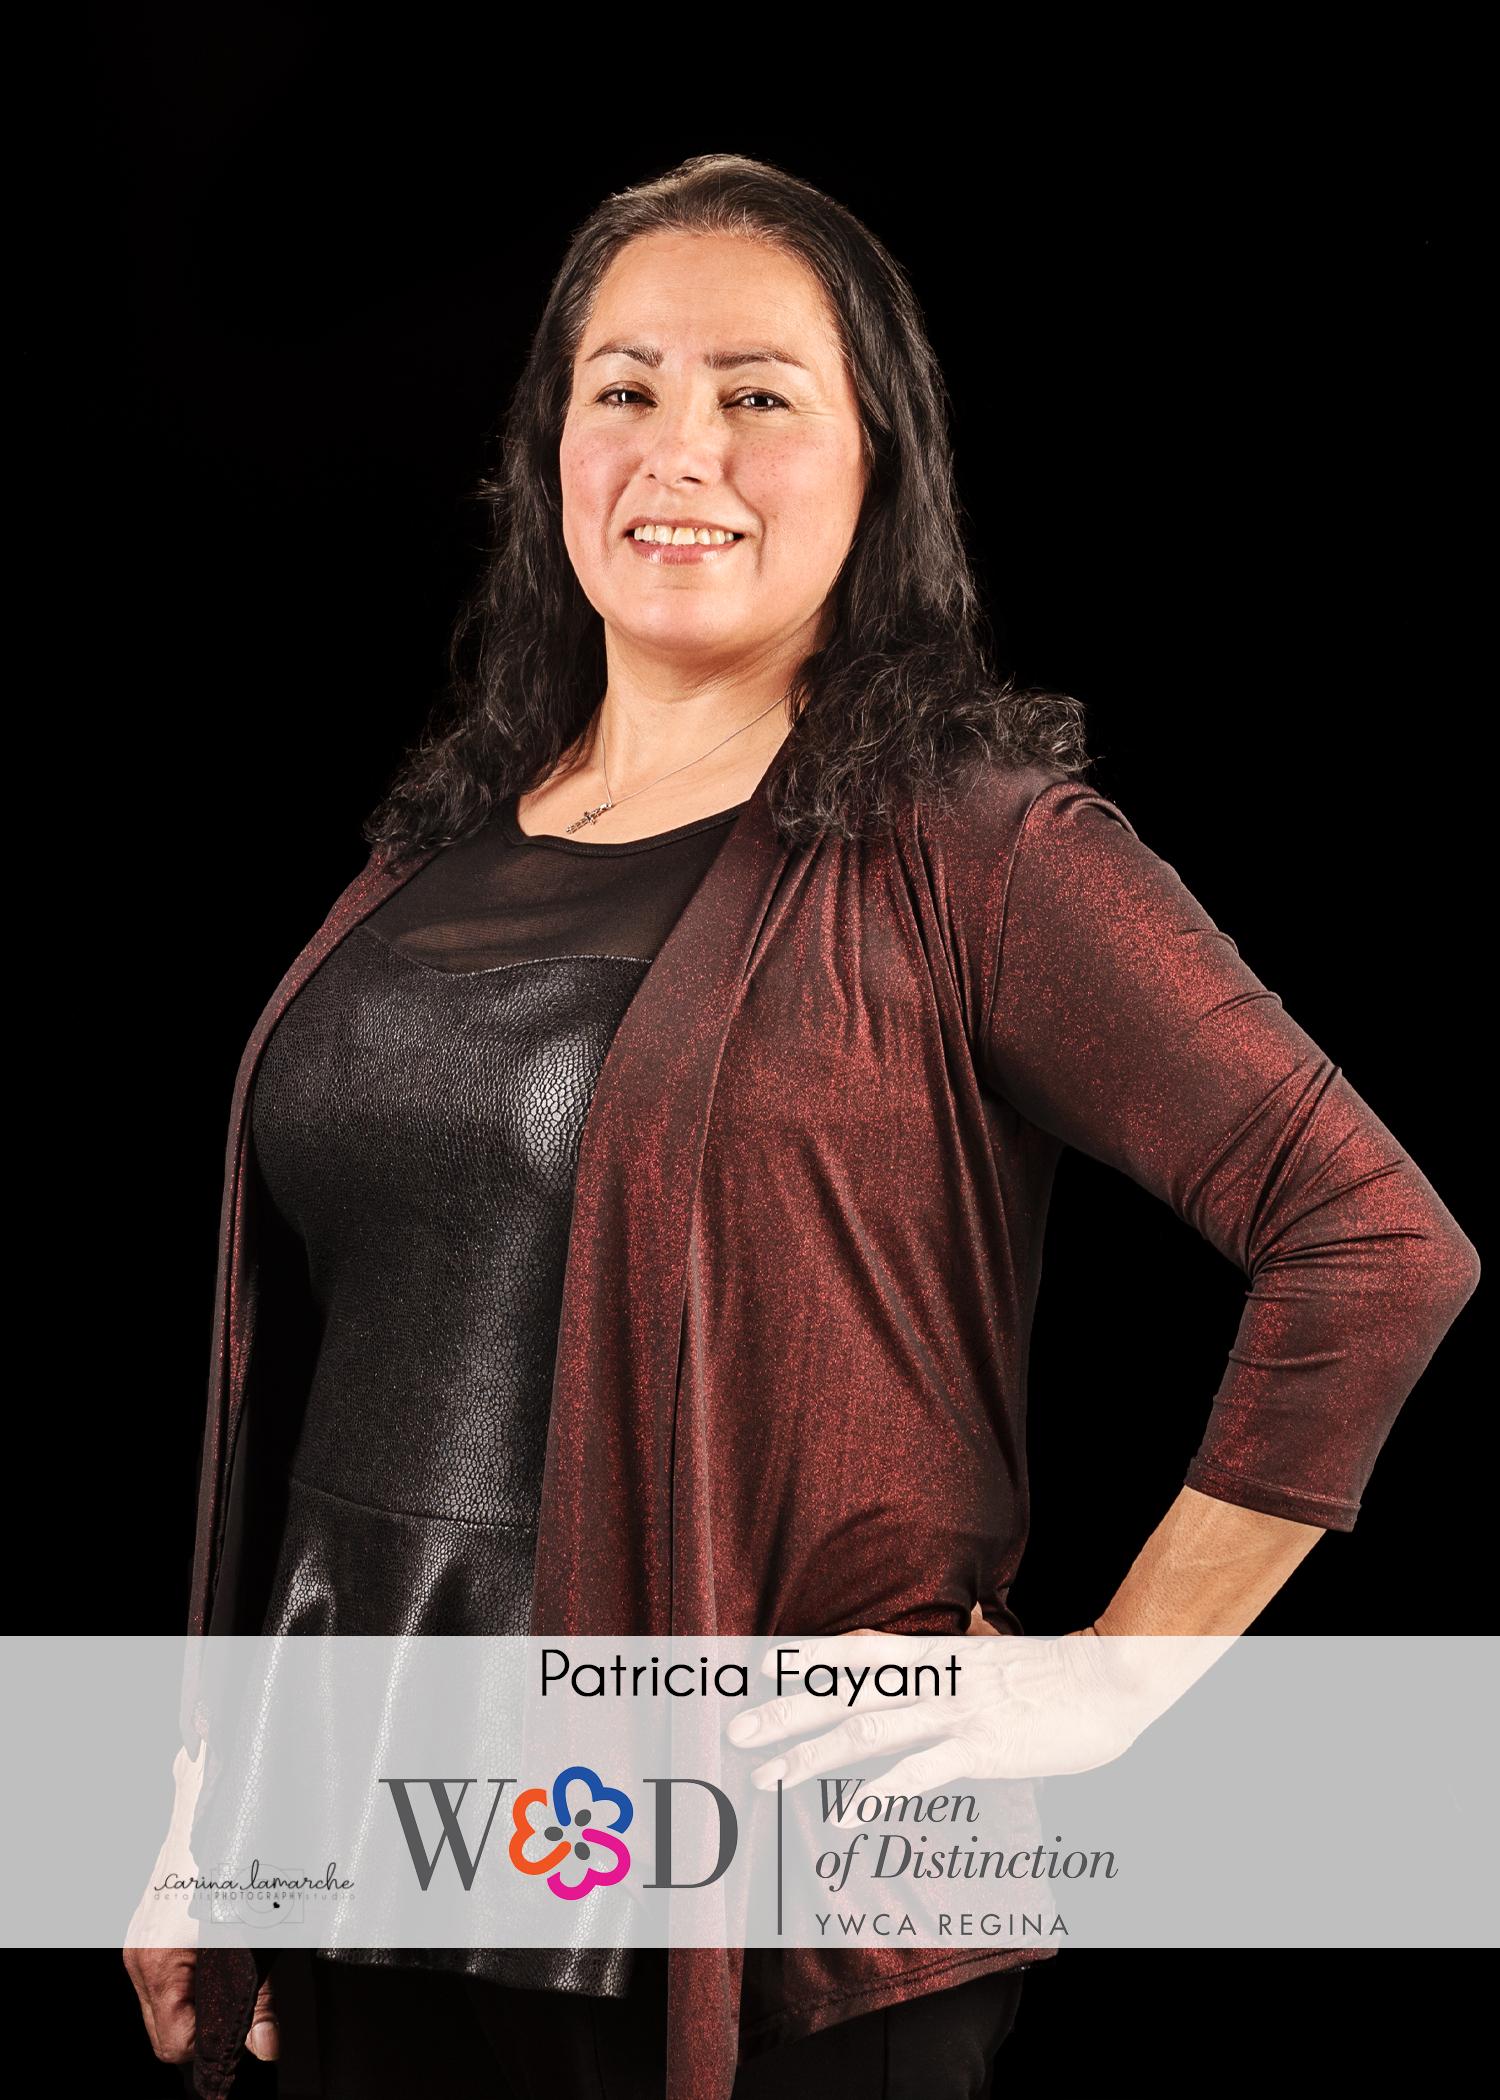 2019_073_Patricia_Fayant_5x7.1.jpg